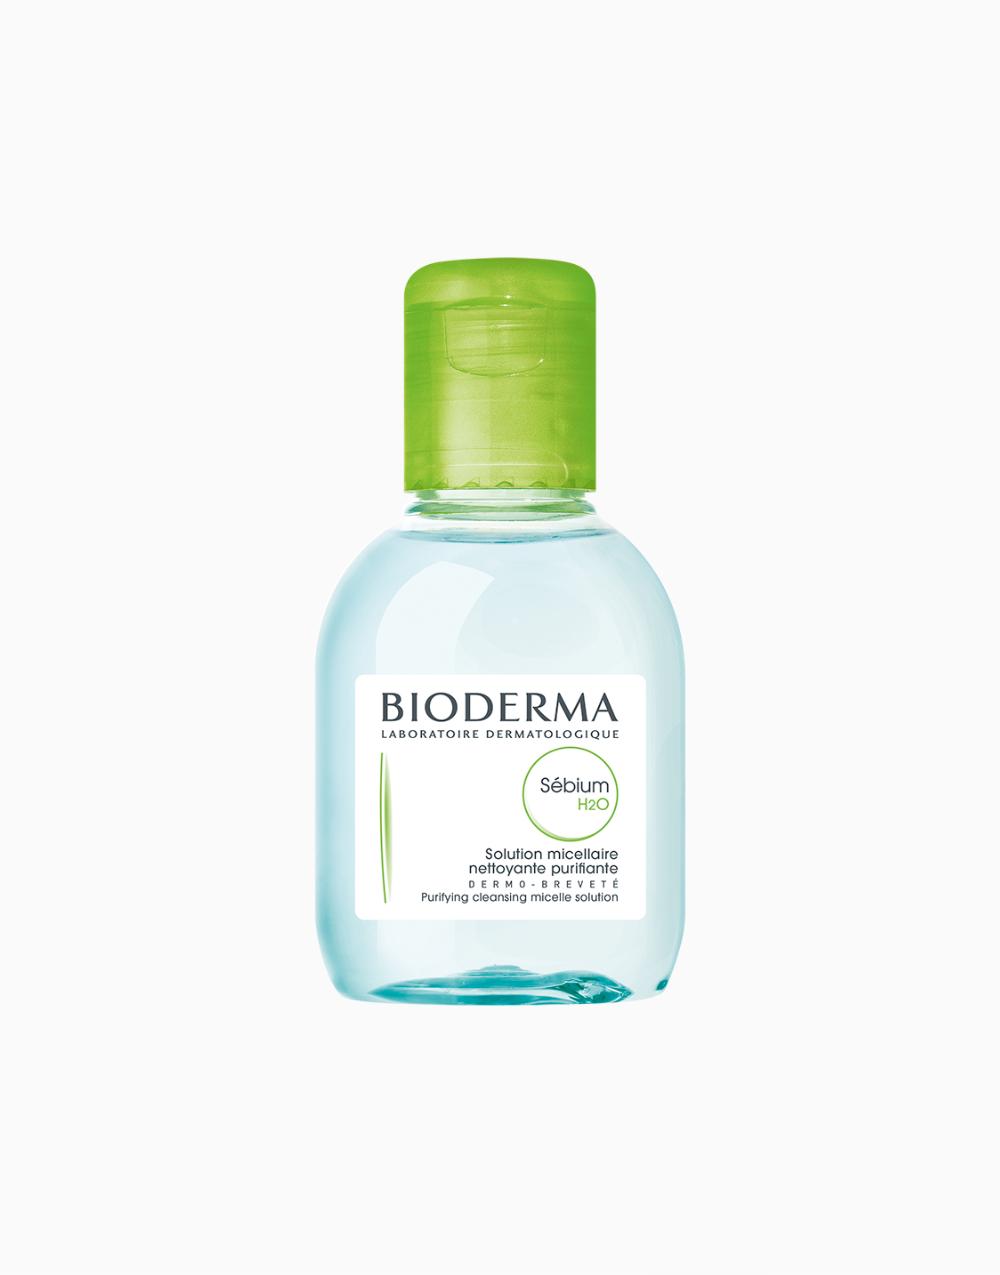 Sebium H2O Micellar Solution (100ml) by Bioderma